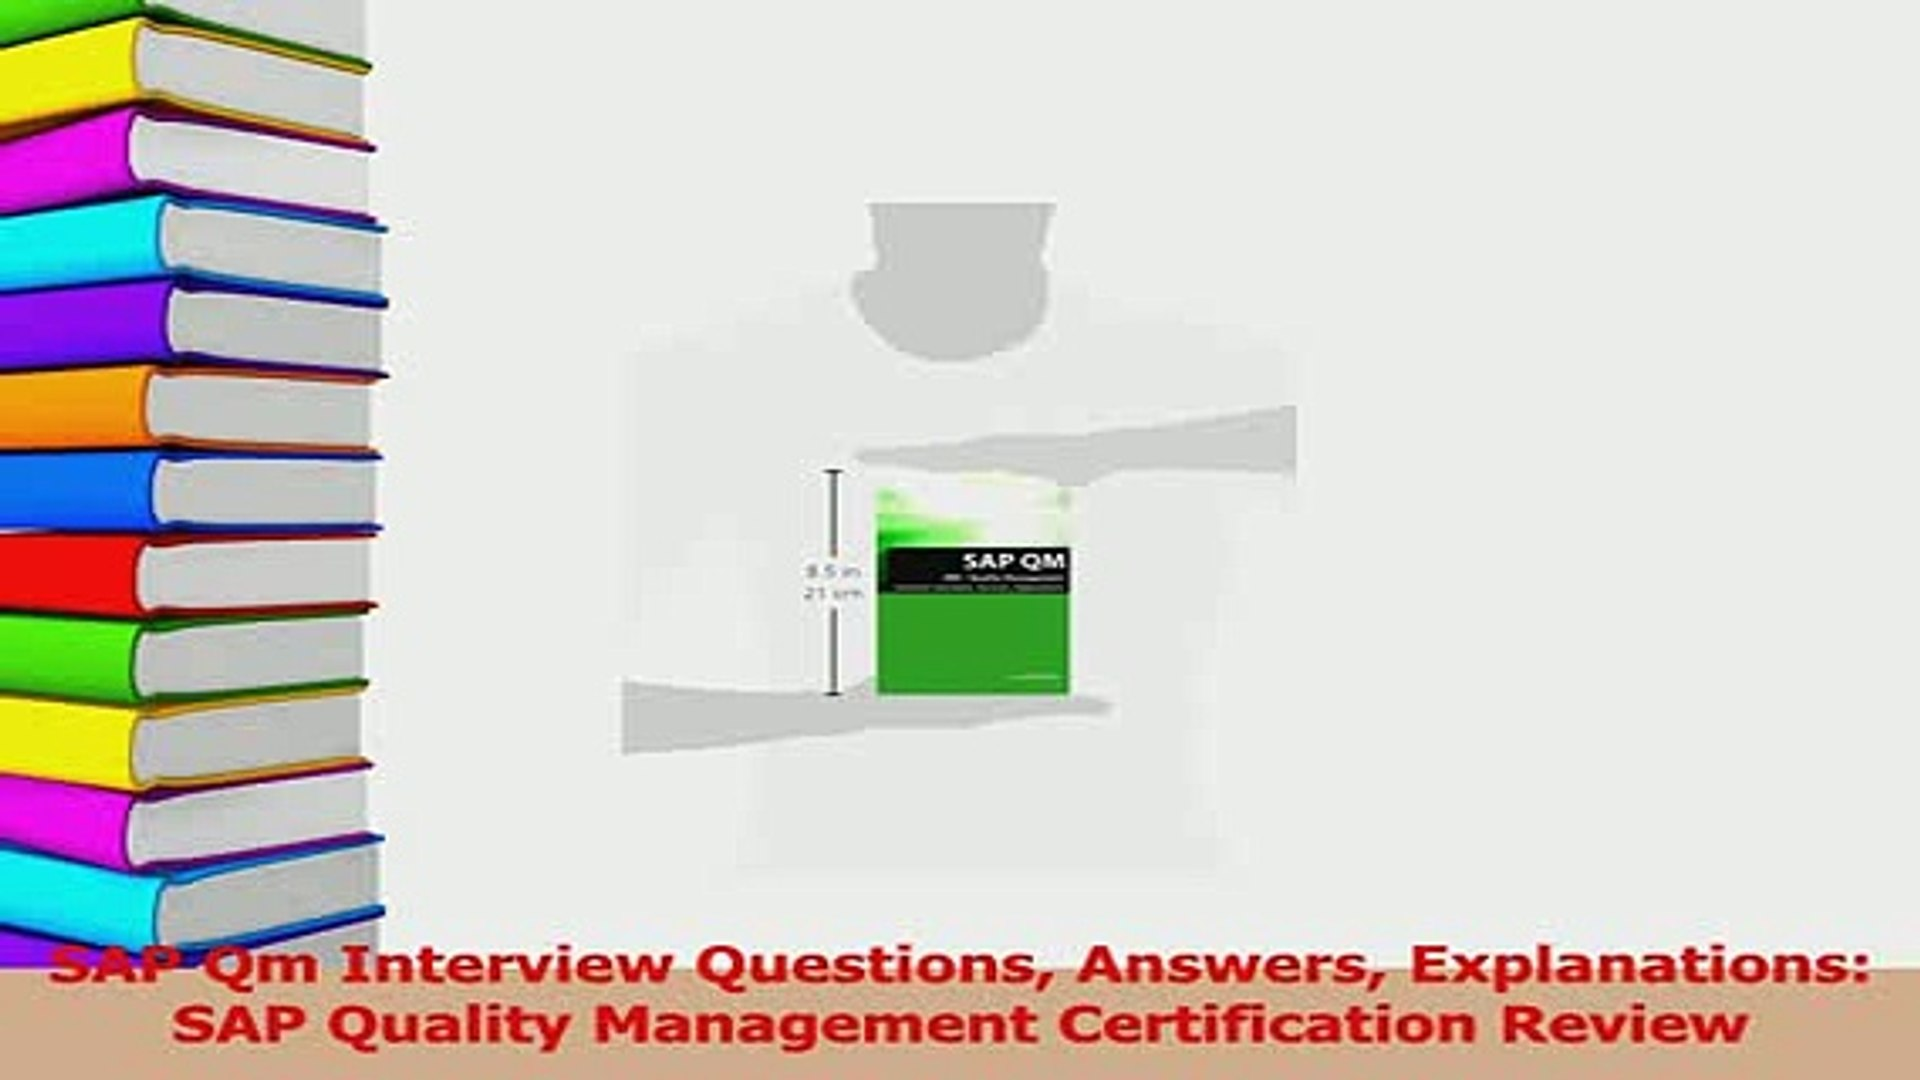 SAP Qm Interview Questions Explanations Answers SAP Quality Management Certification Review